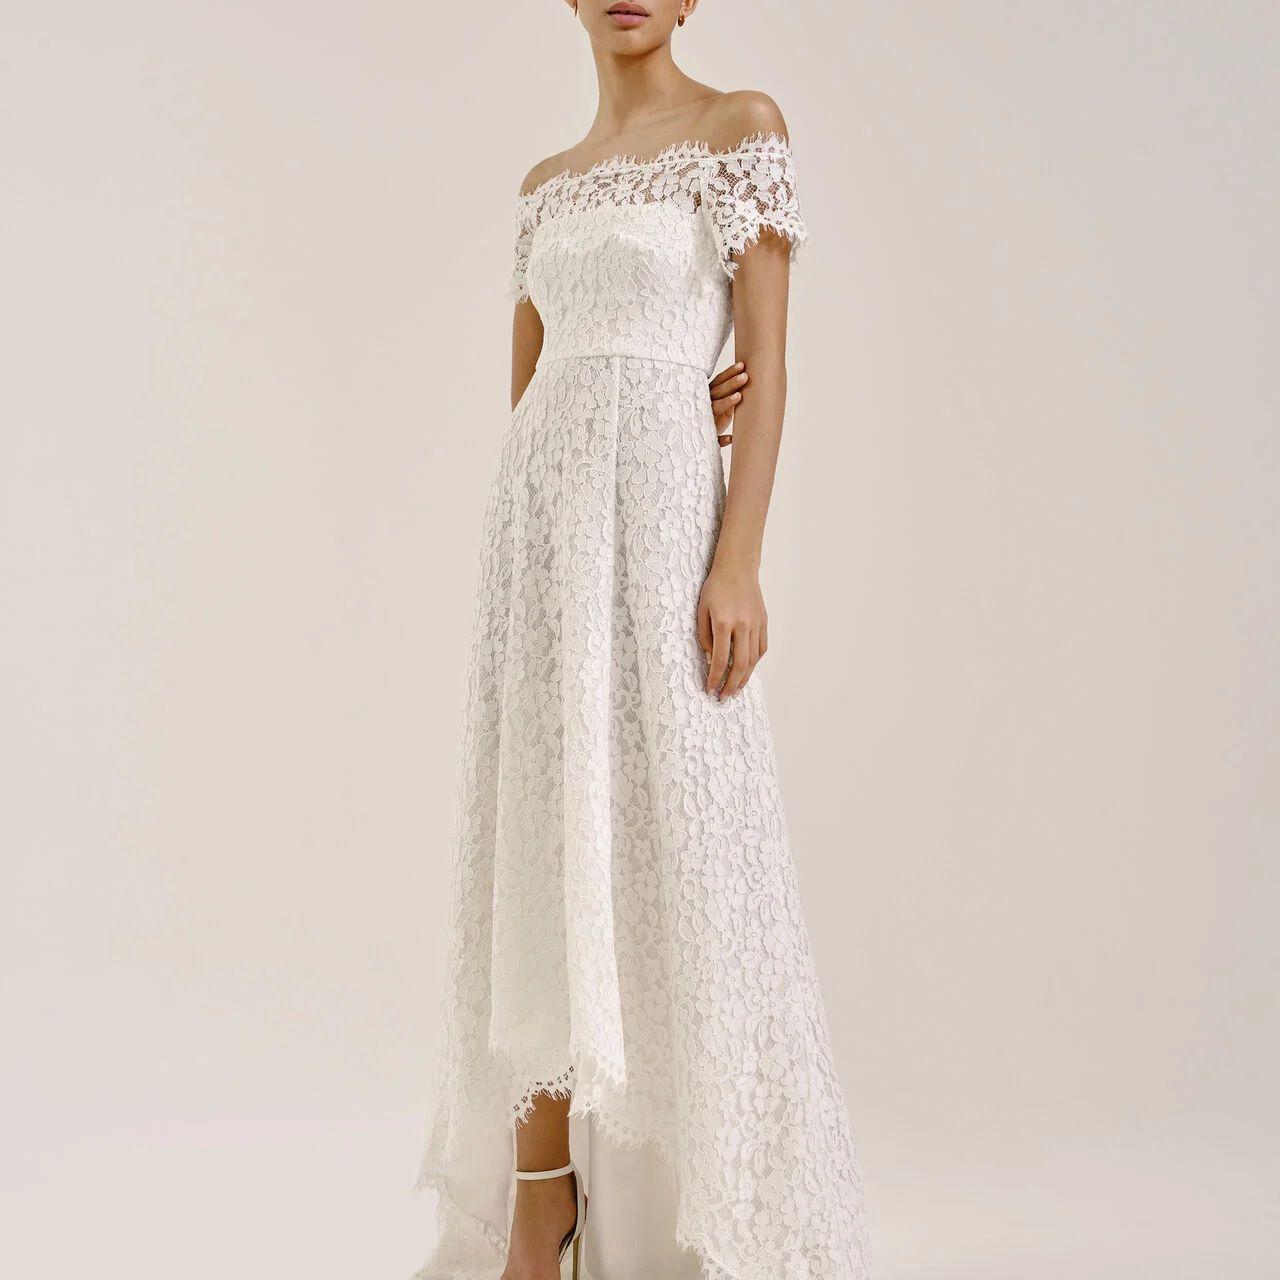 Model in lacy off-the-shoulder wedding dress with subtle high-low hem